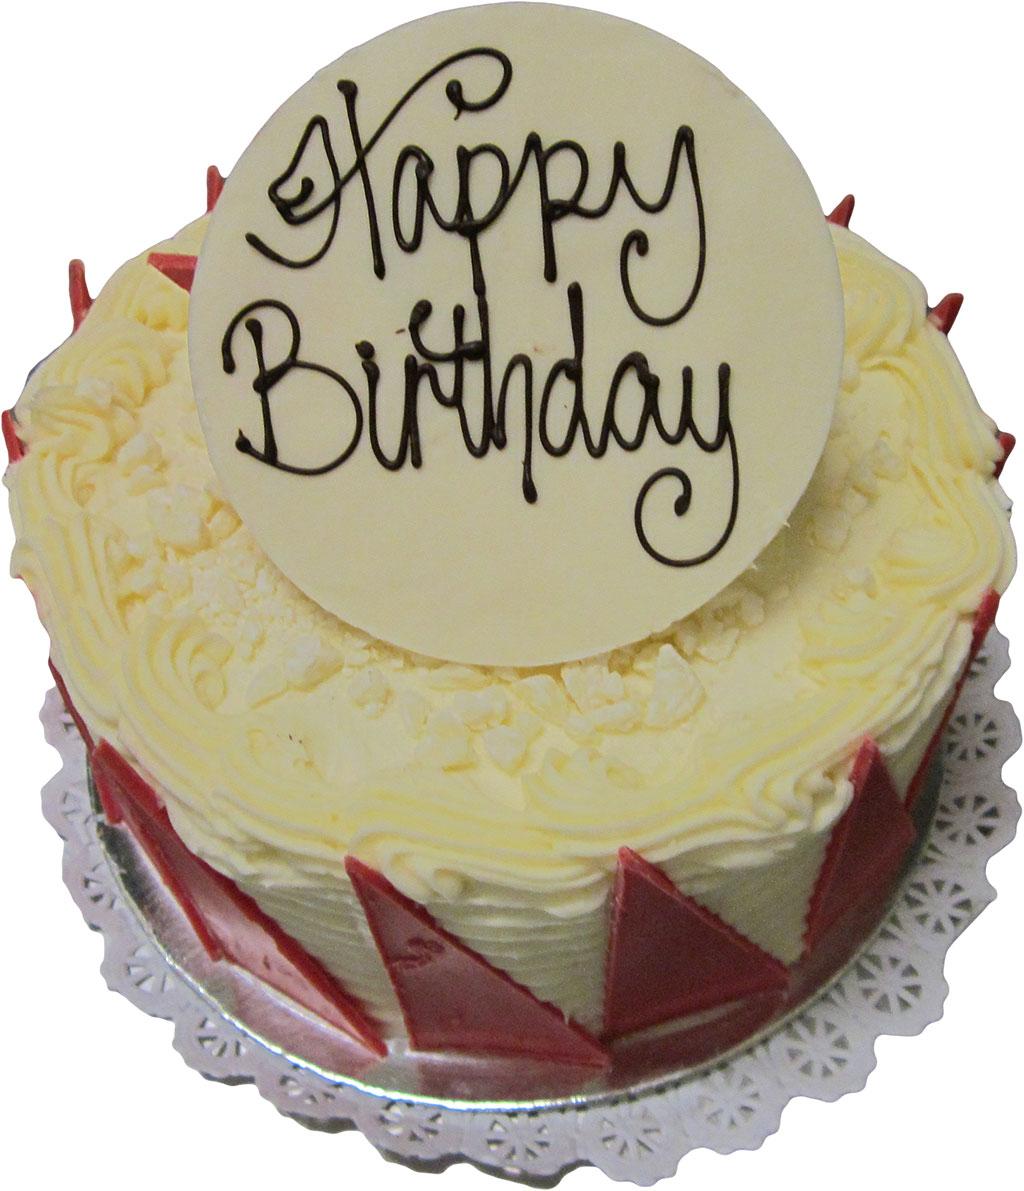 Home / Cakes / Celebration & Birthday Cakes / Red Velvet Birthday Cake